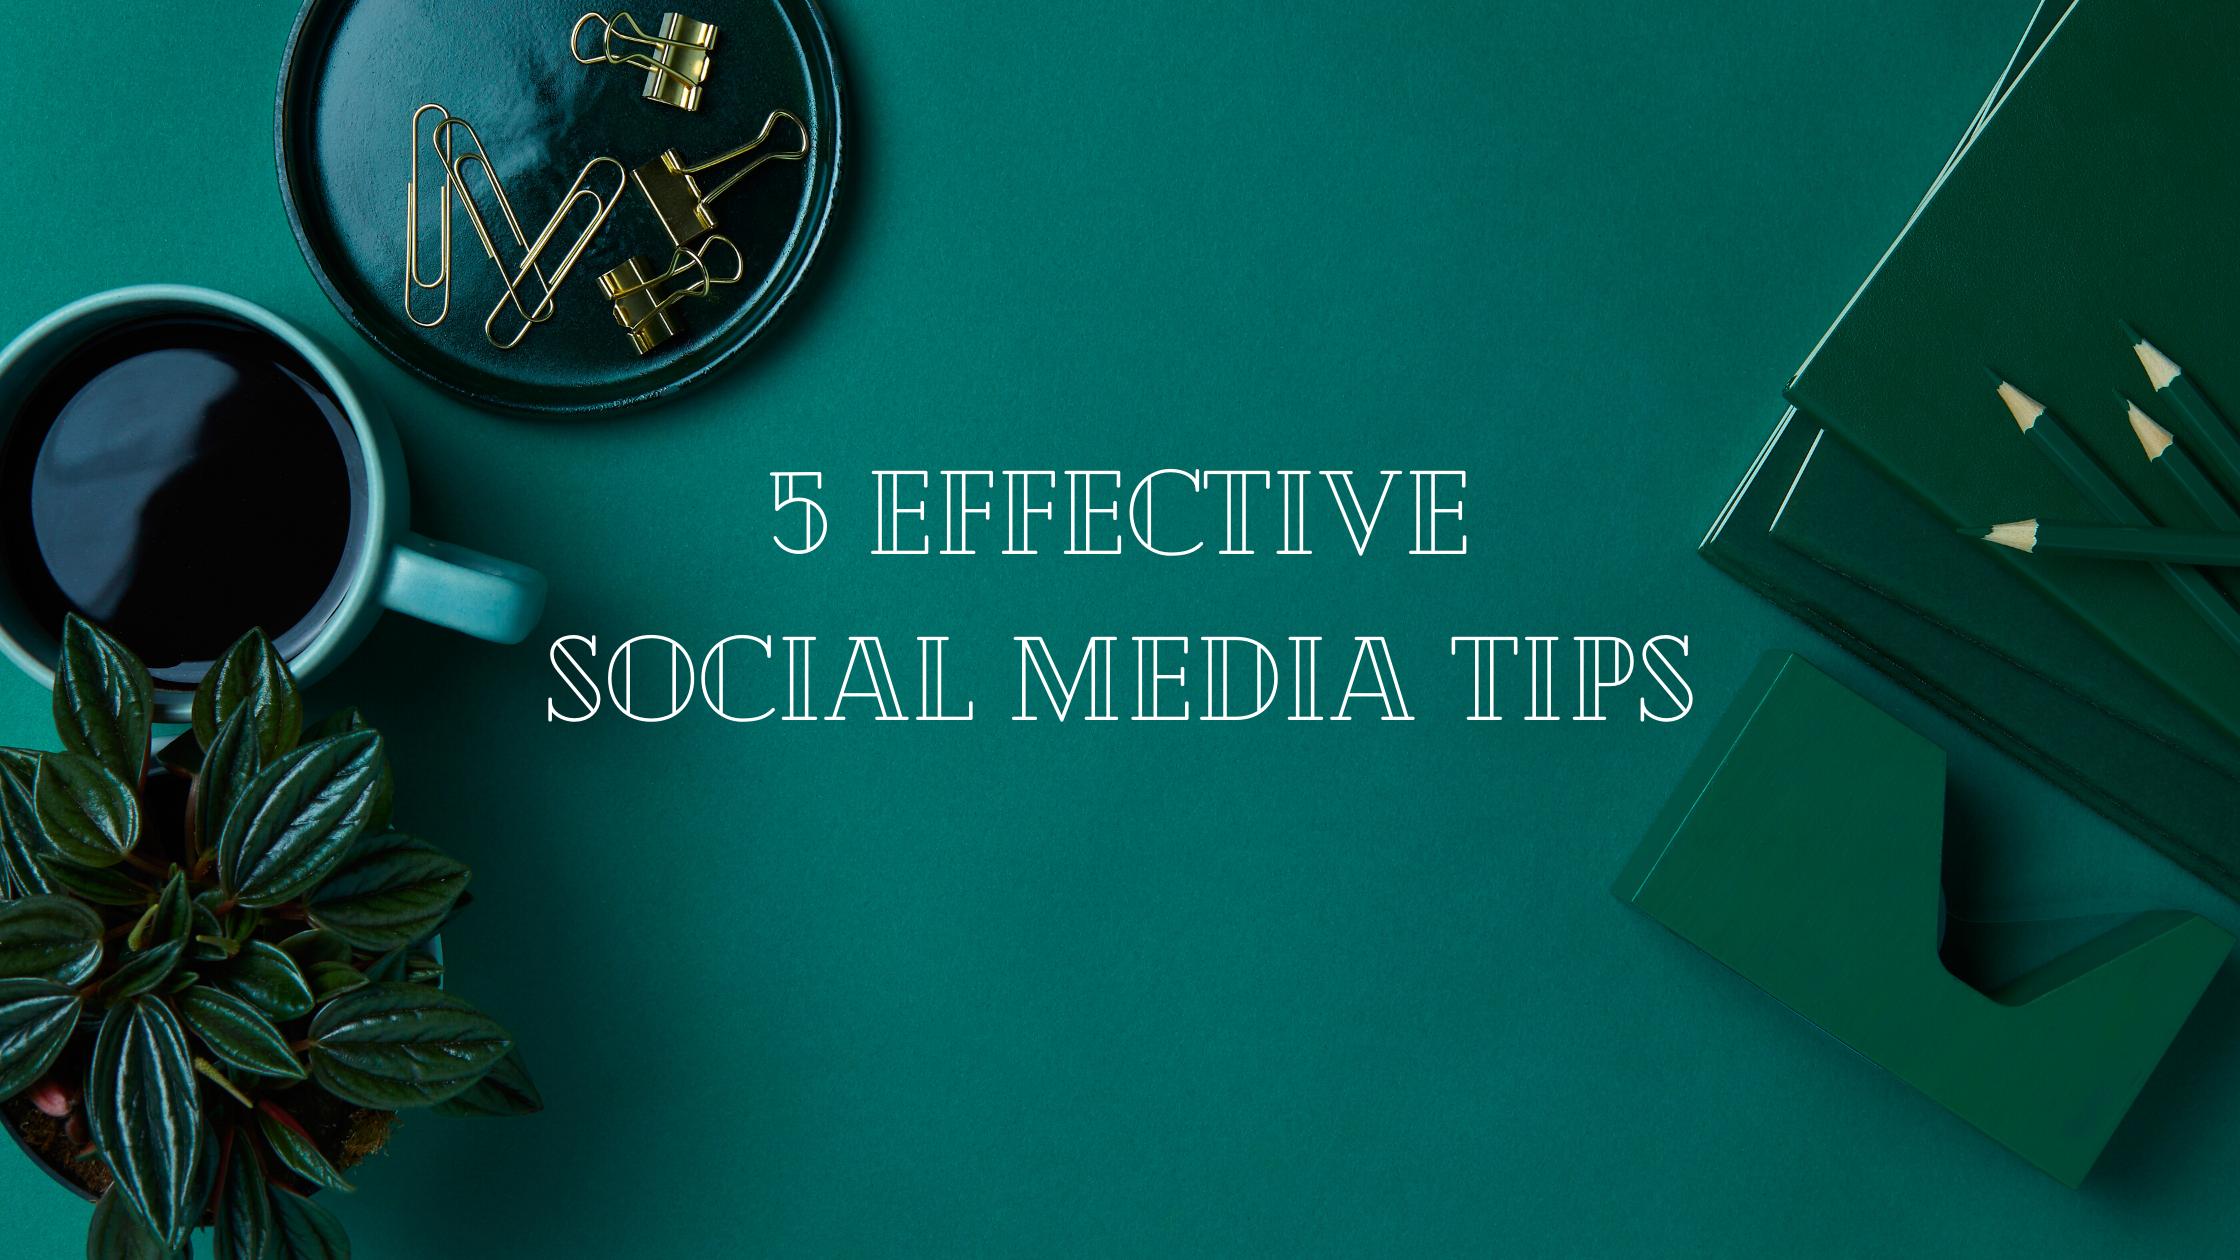 Effective Social Media Tips